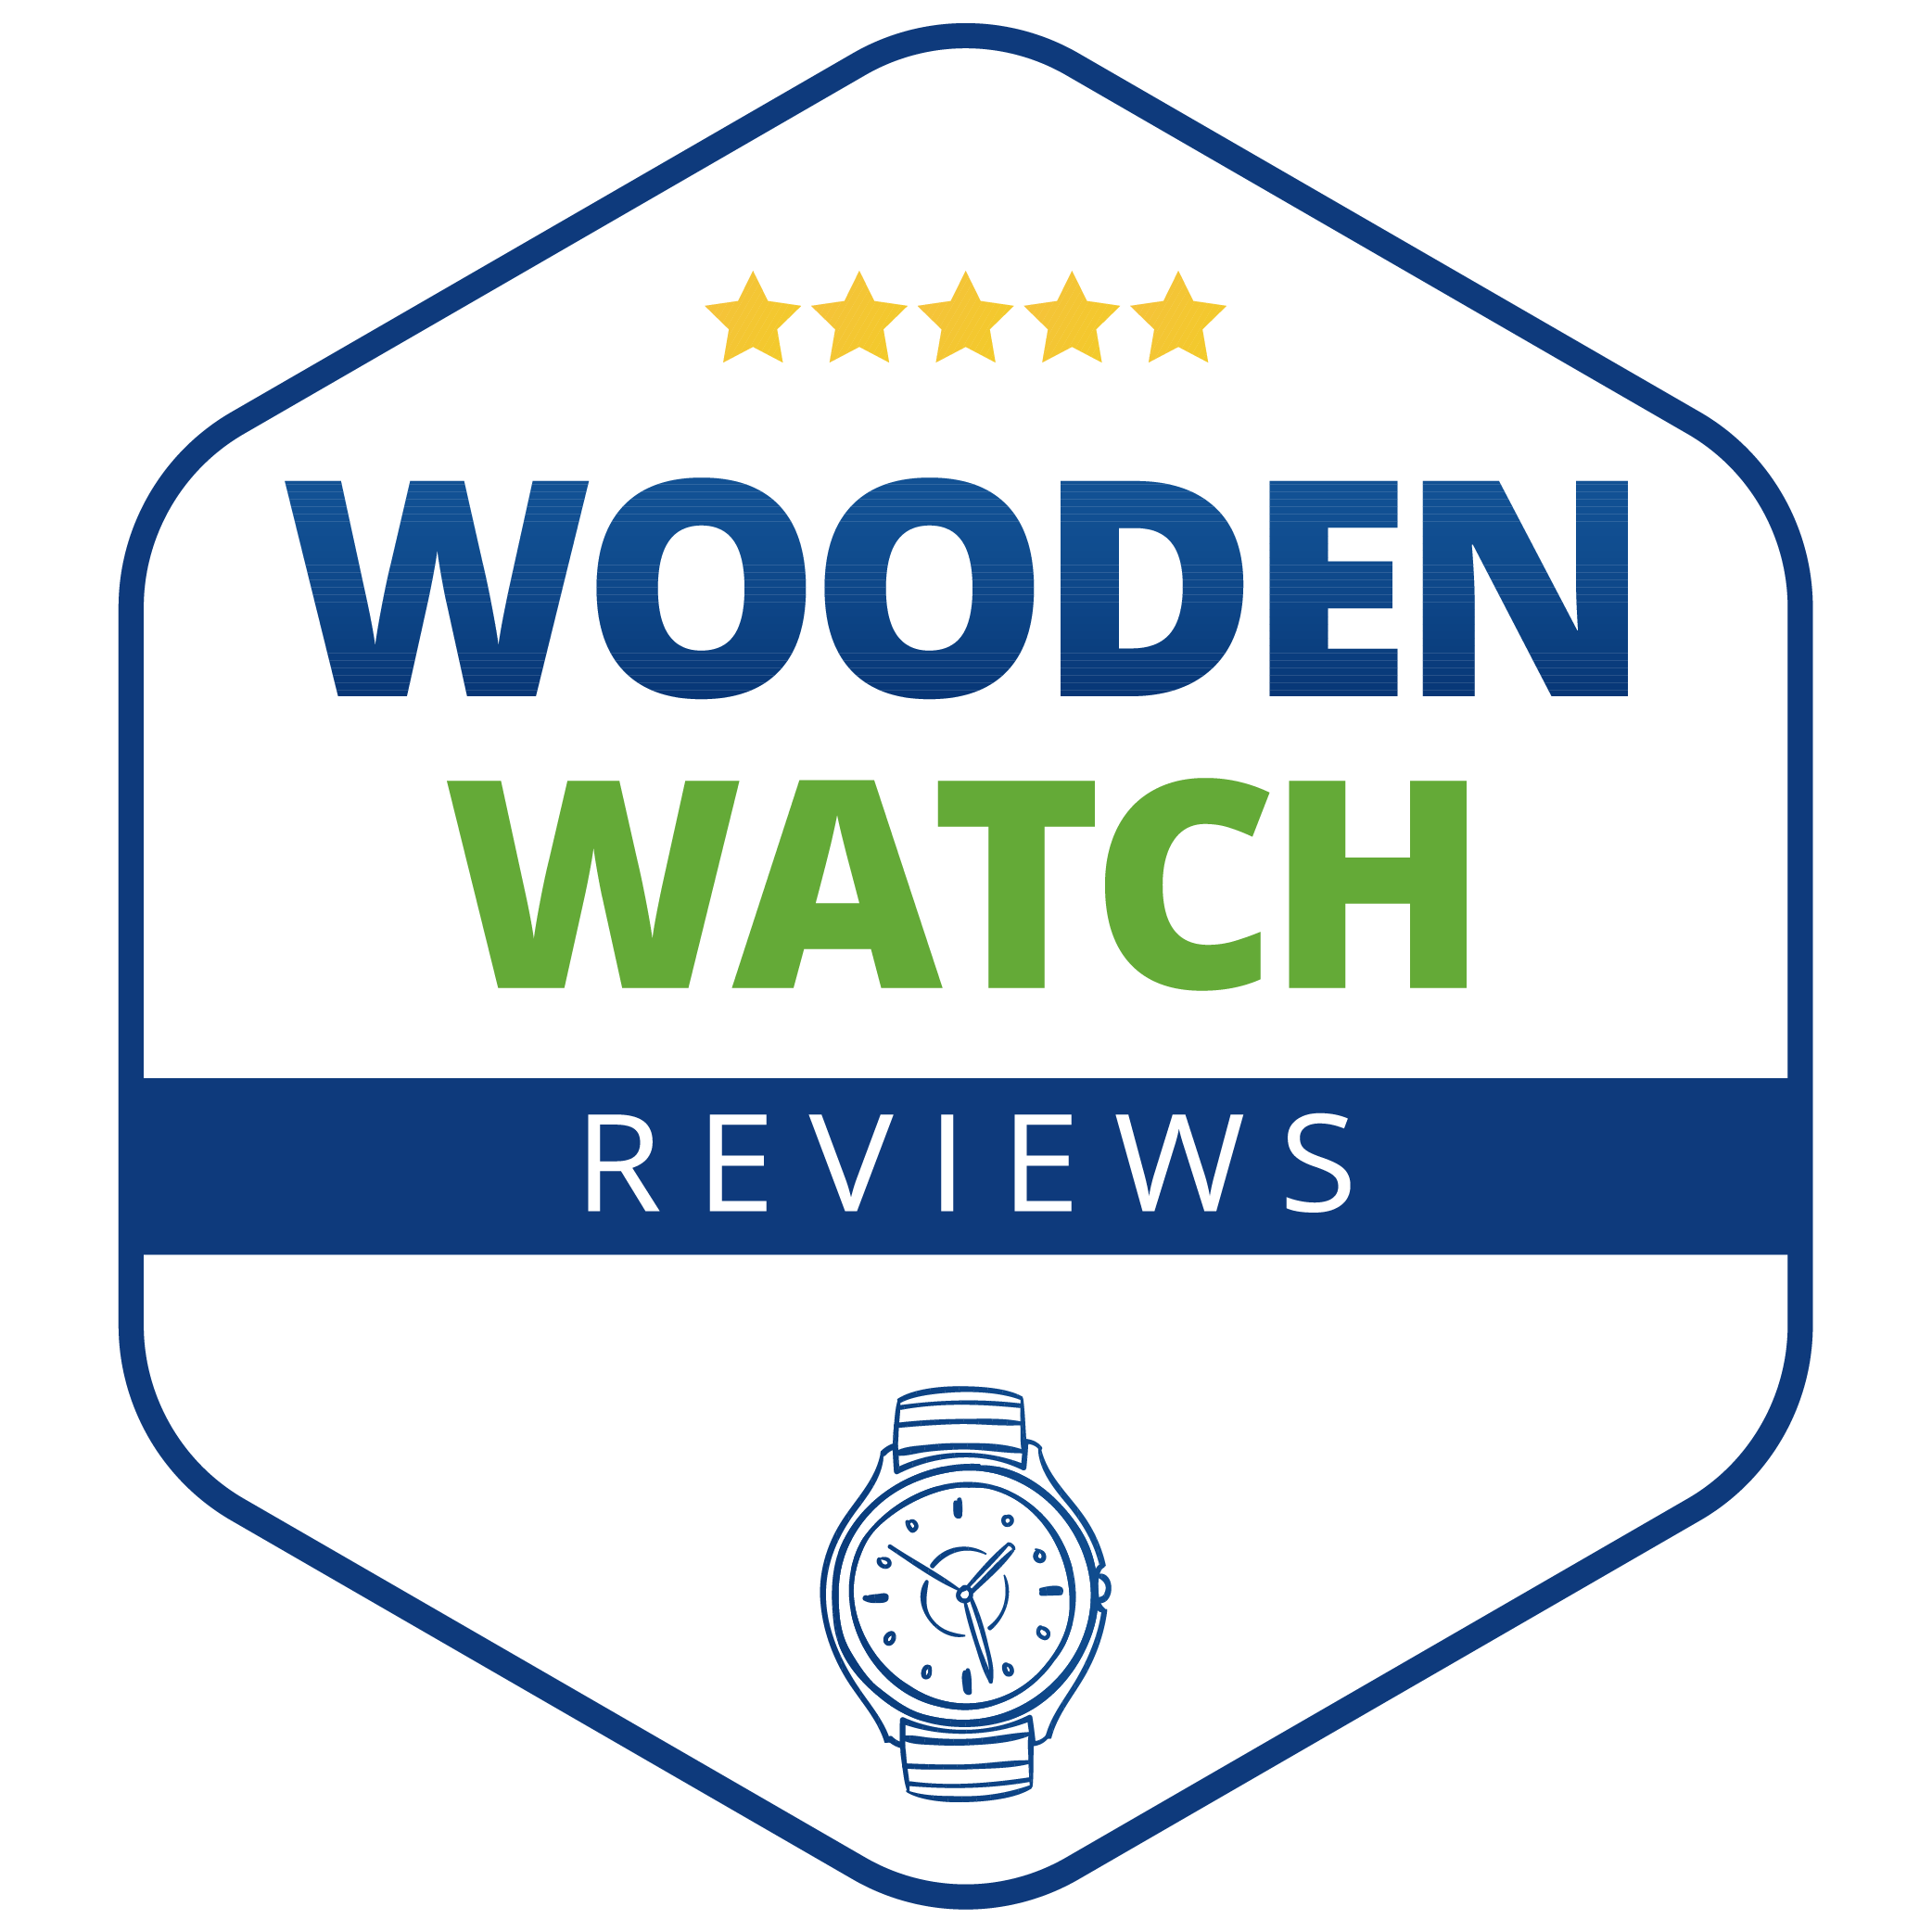 Wooden Watch Reviews